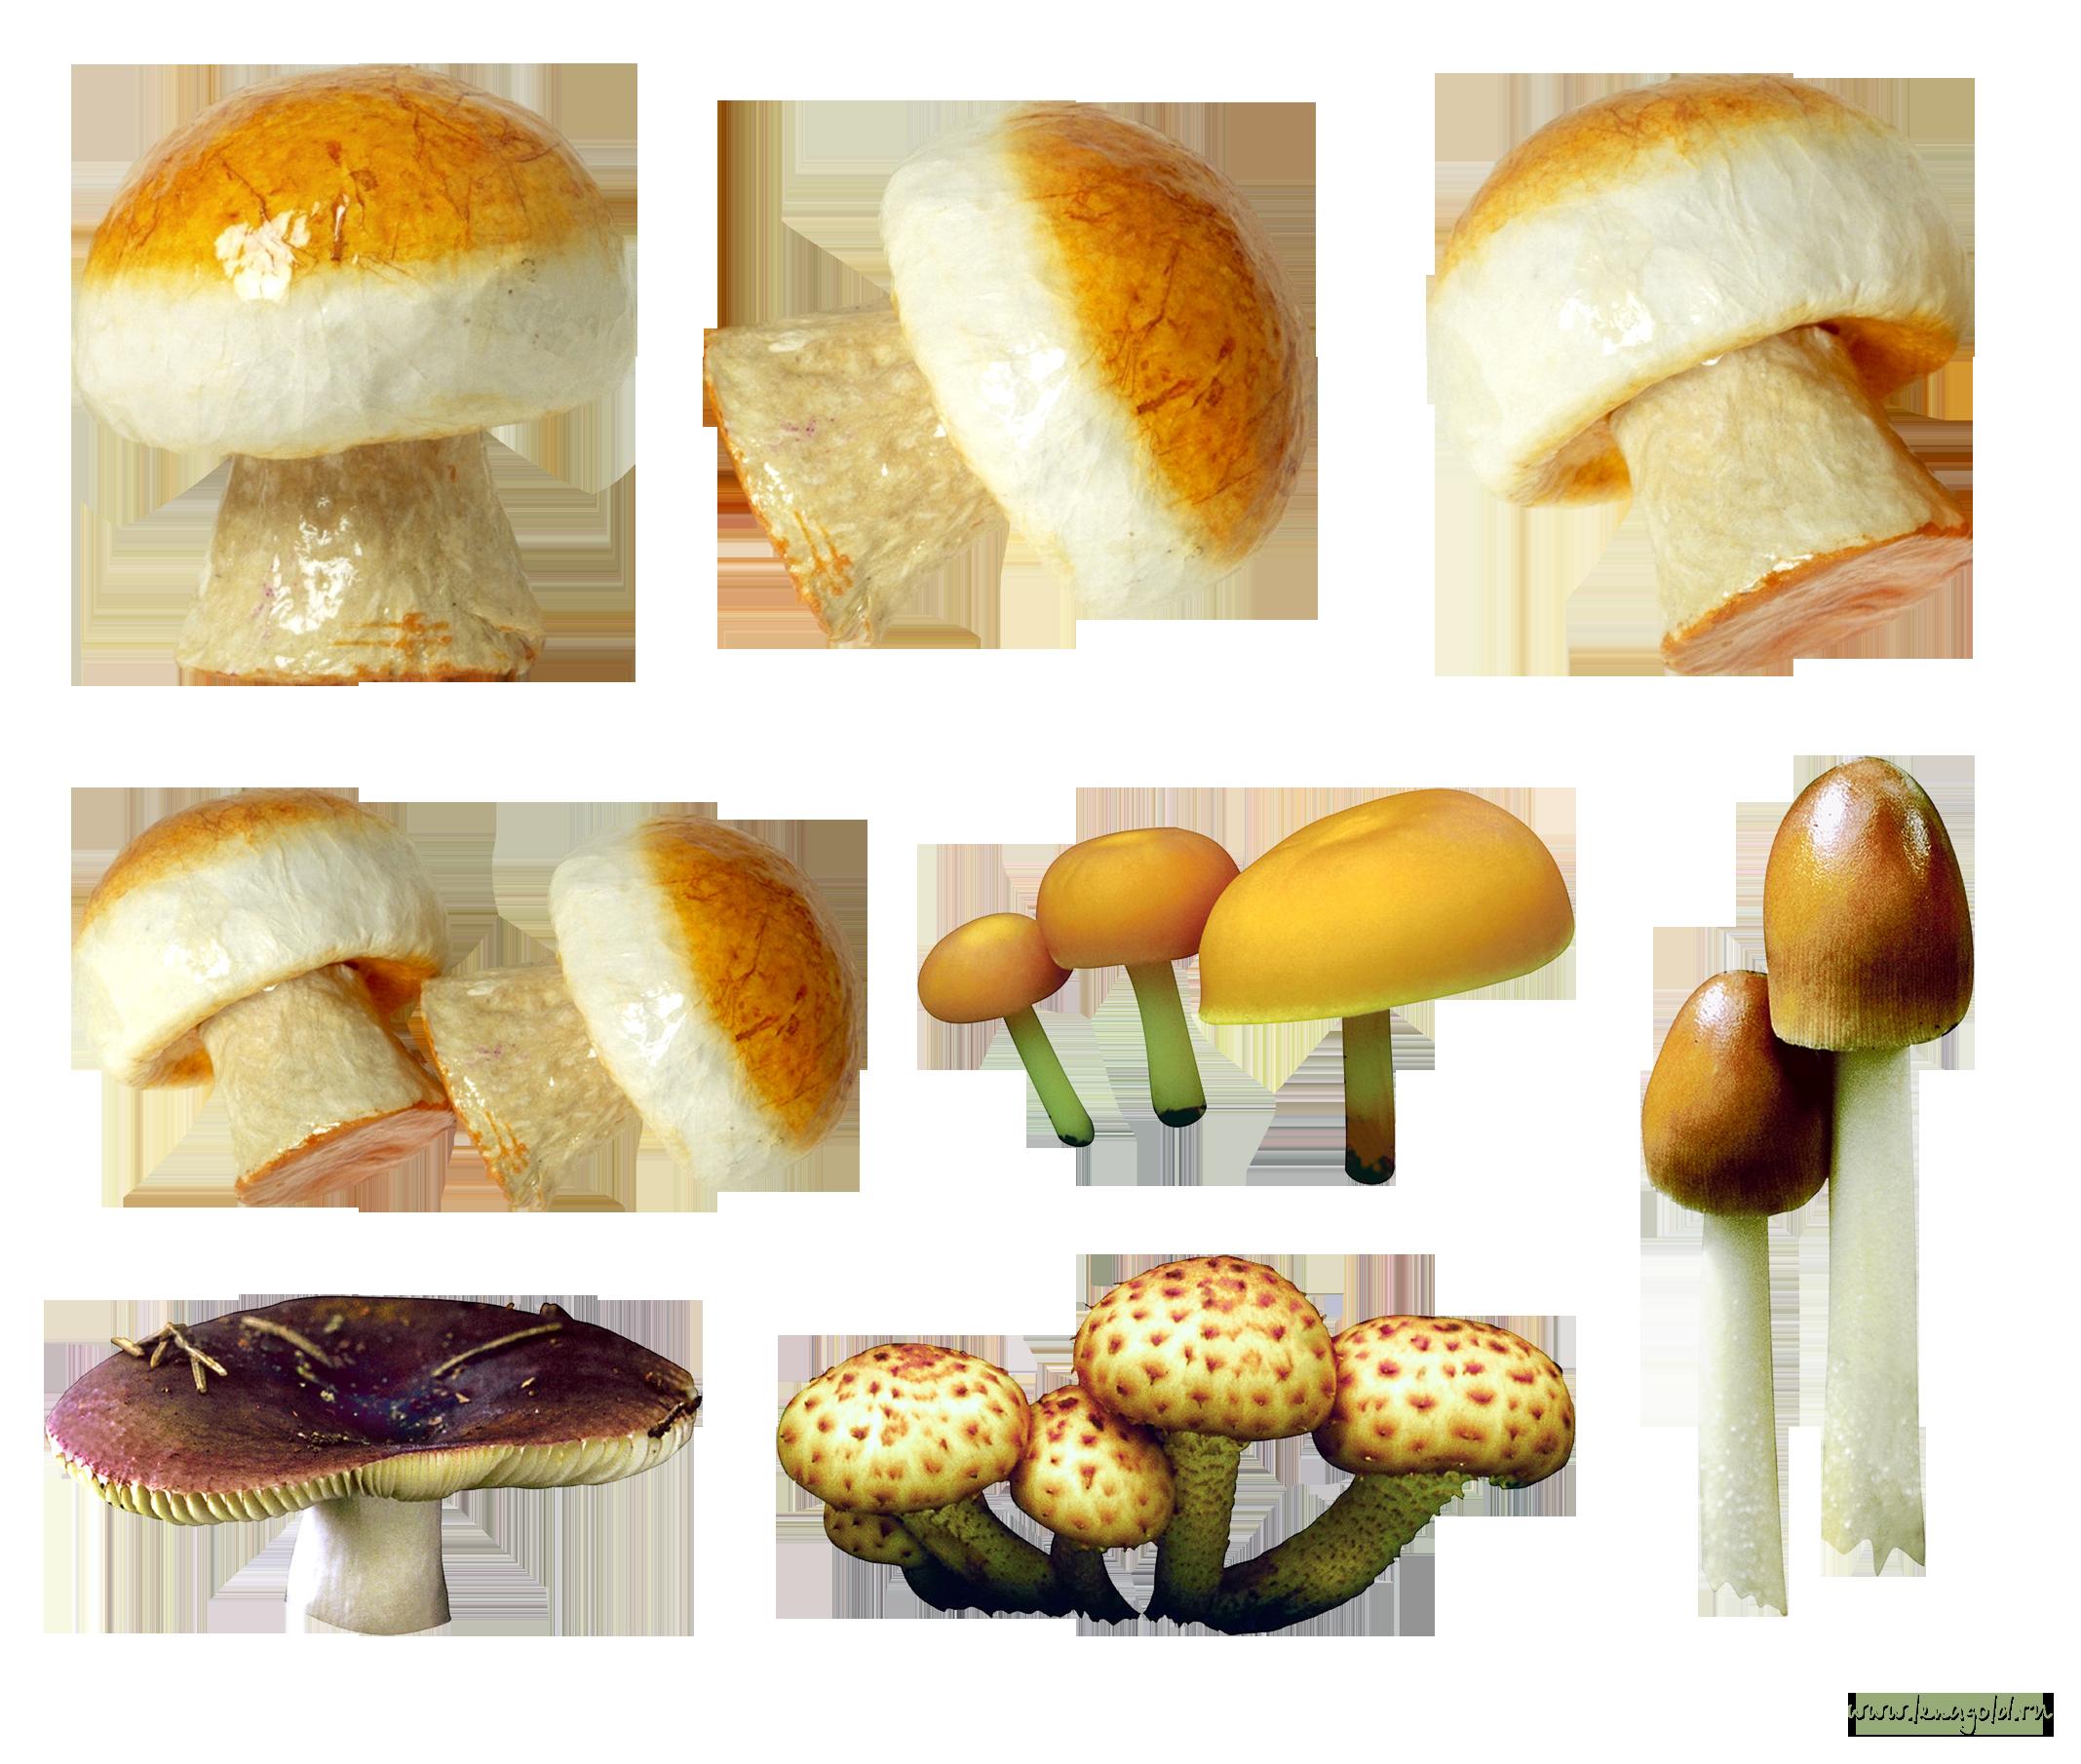 Mushroom PNG image